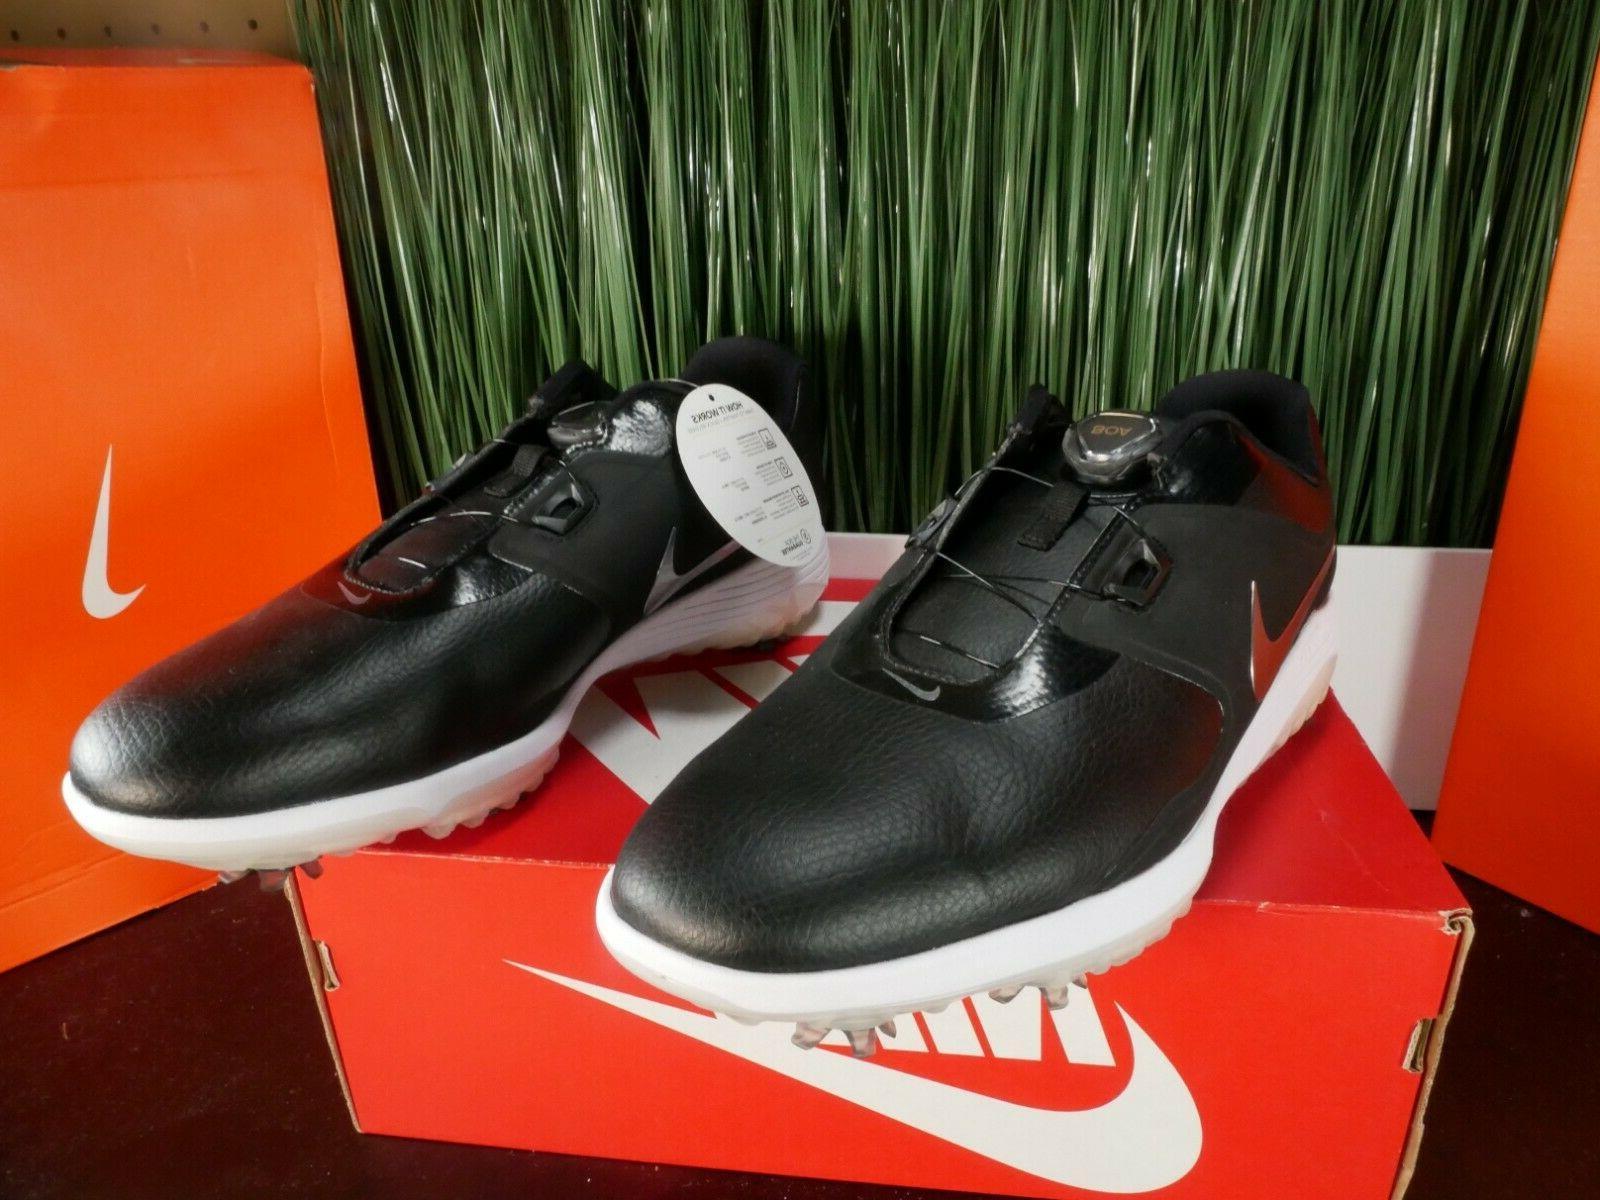 Nike Mens Shoes Black/White